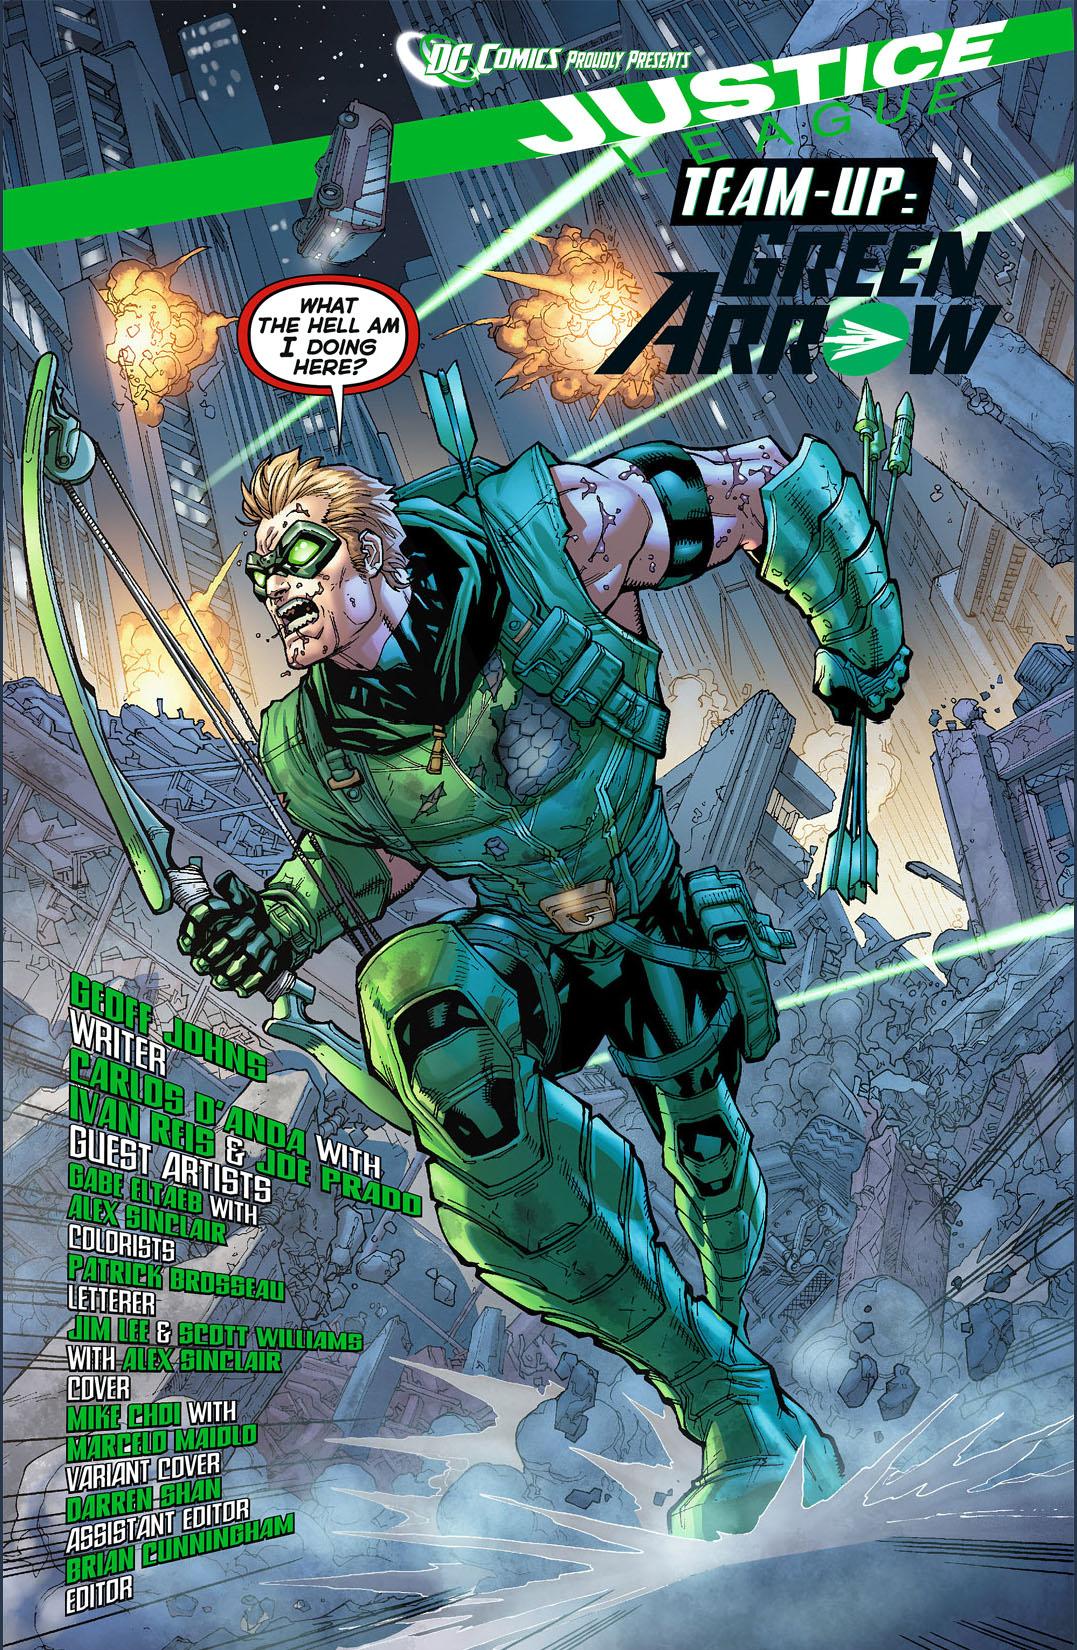 52 Photos 37 Reviews: Green Arrow (New 52)